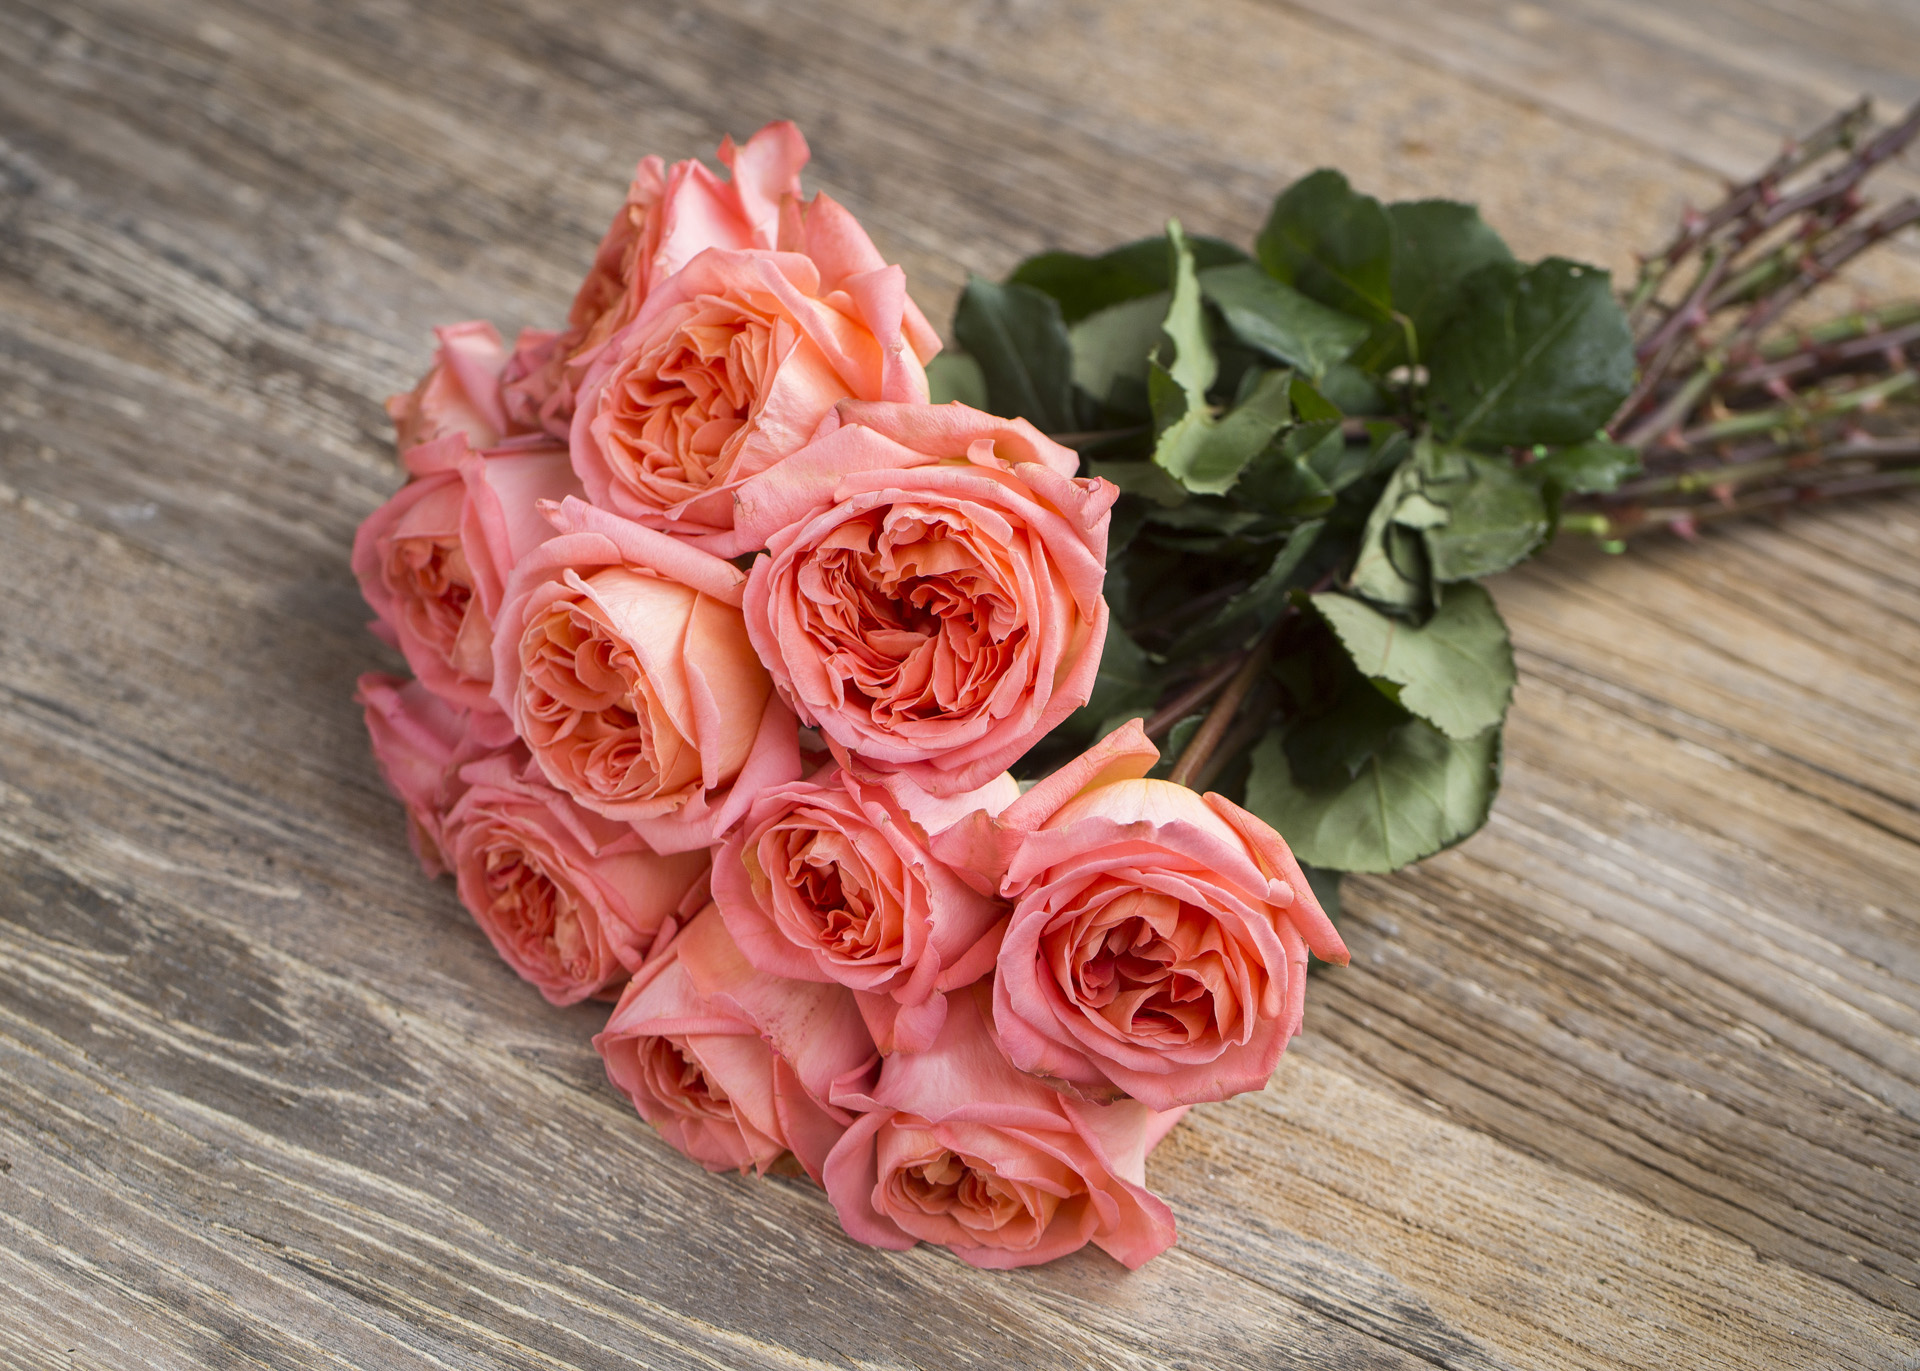 The top 5 meilland jardin parfum roses parfum flower for Jardin roses